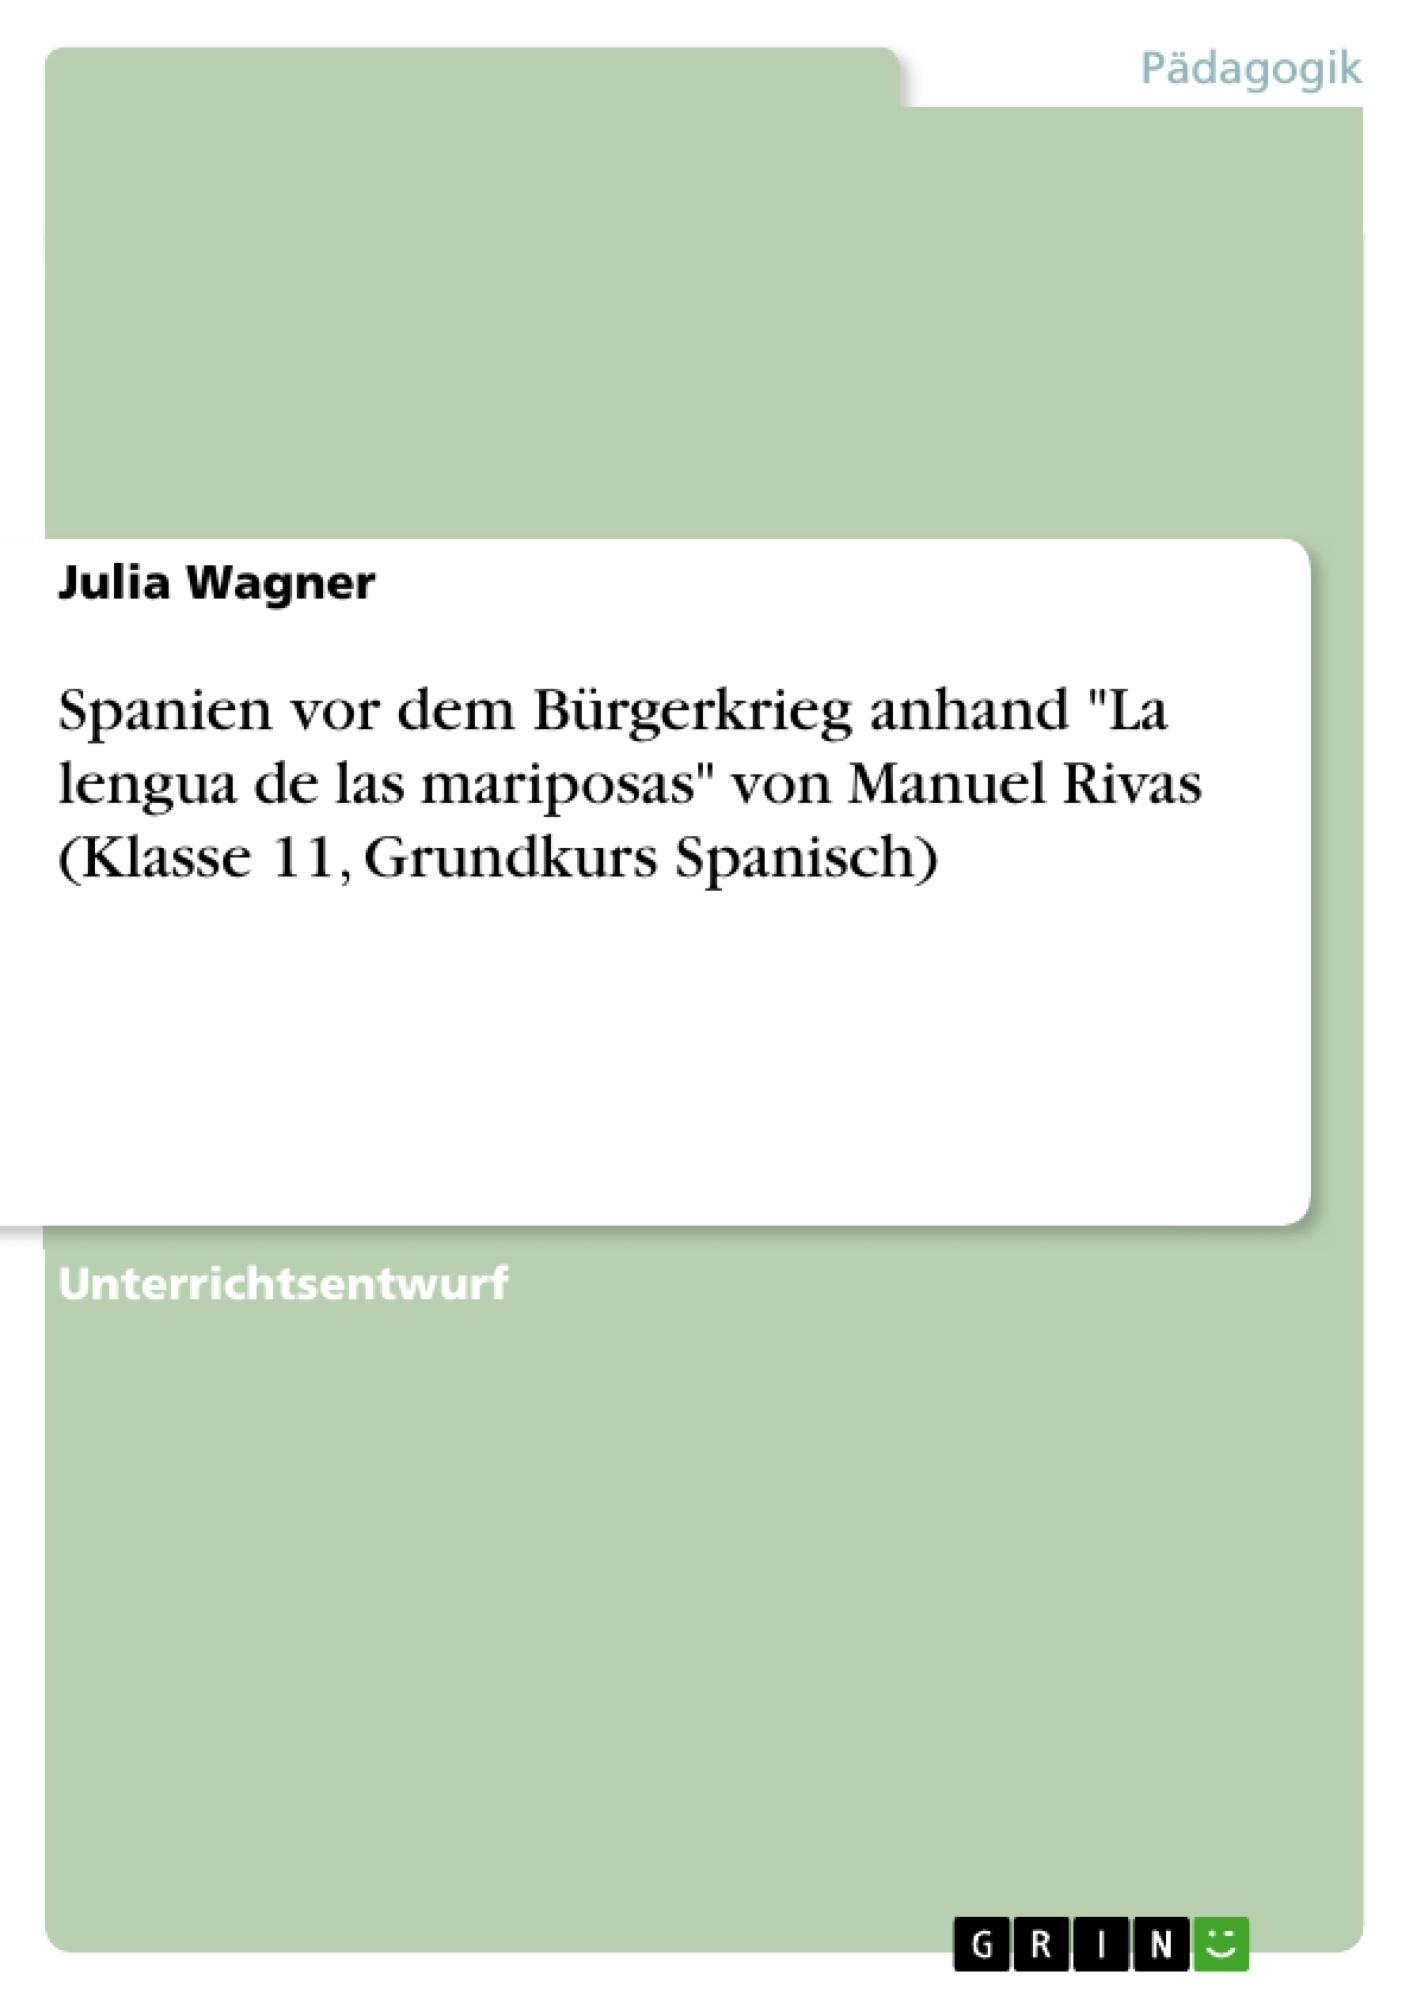 "Titel: Spanien for dem Bürgerkrieg anhand ""La lengua de las mariposas"" von Manuel Rivas (Klasse 11, Grundkurs Spanisch)"